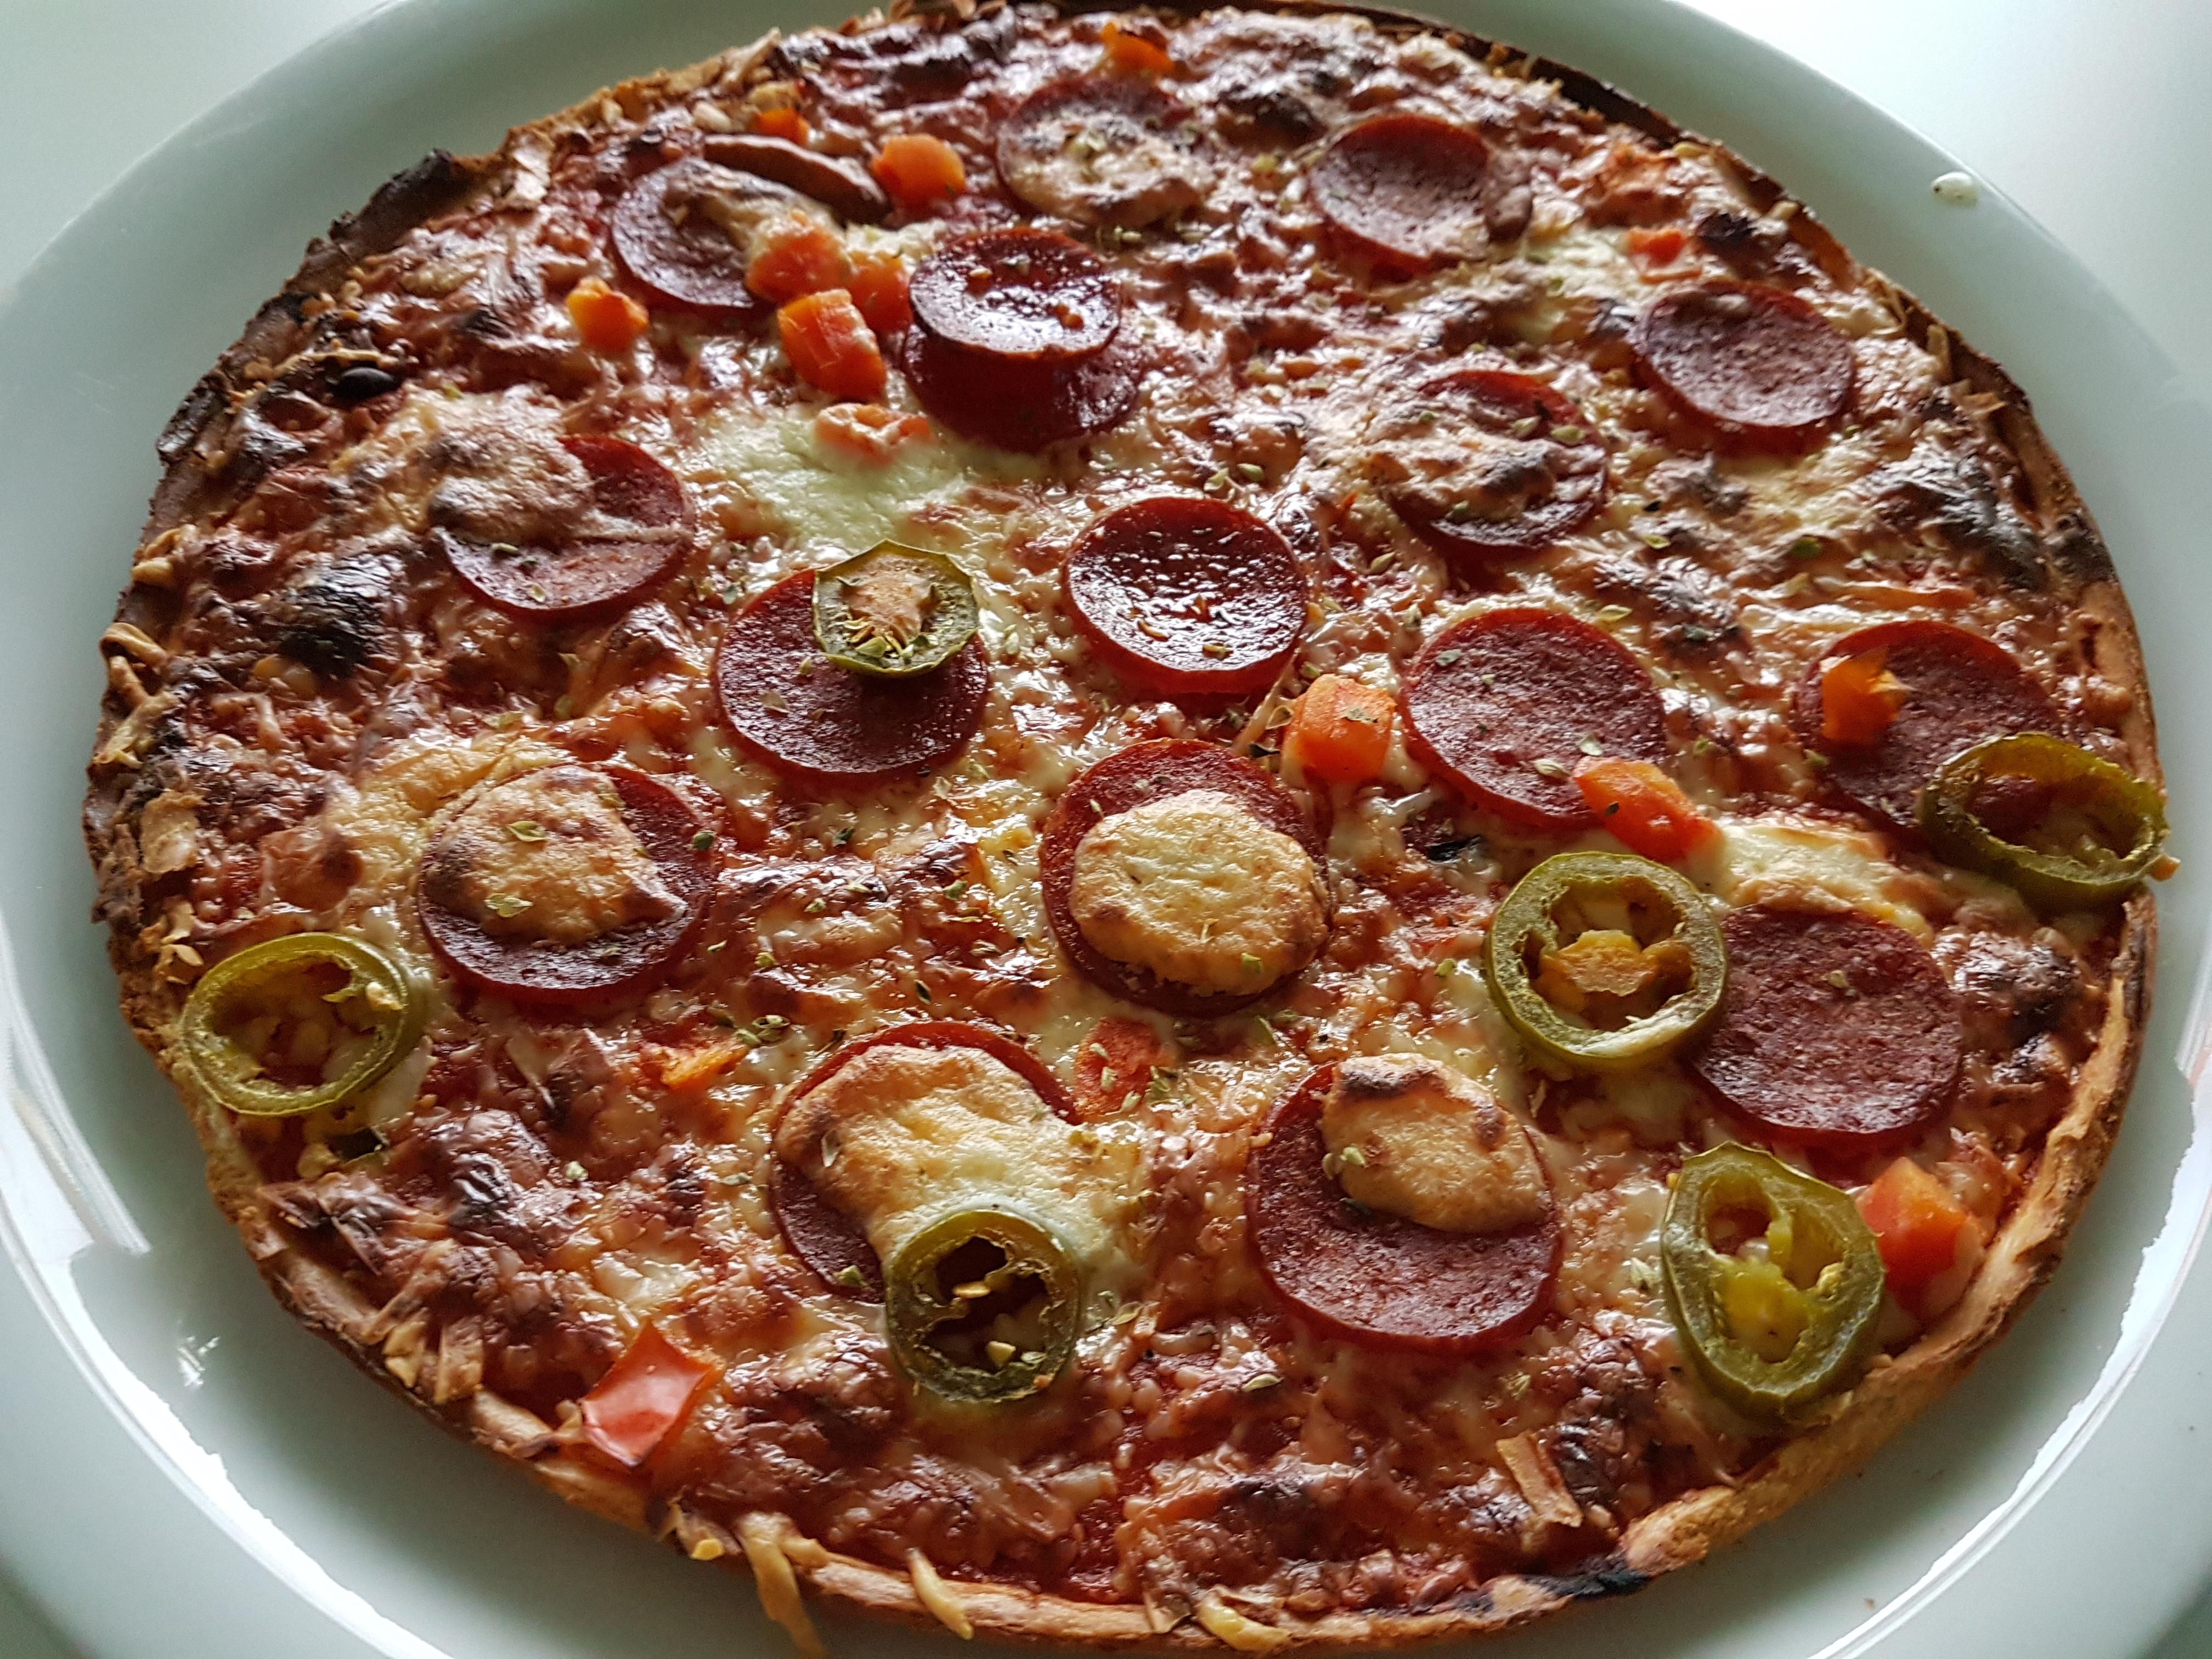 http://foodloader.net/Holz_2017-05-24_Pizza.jpg